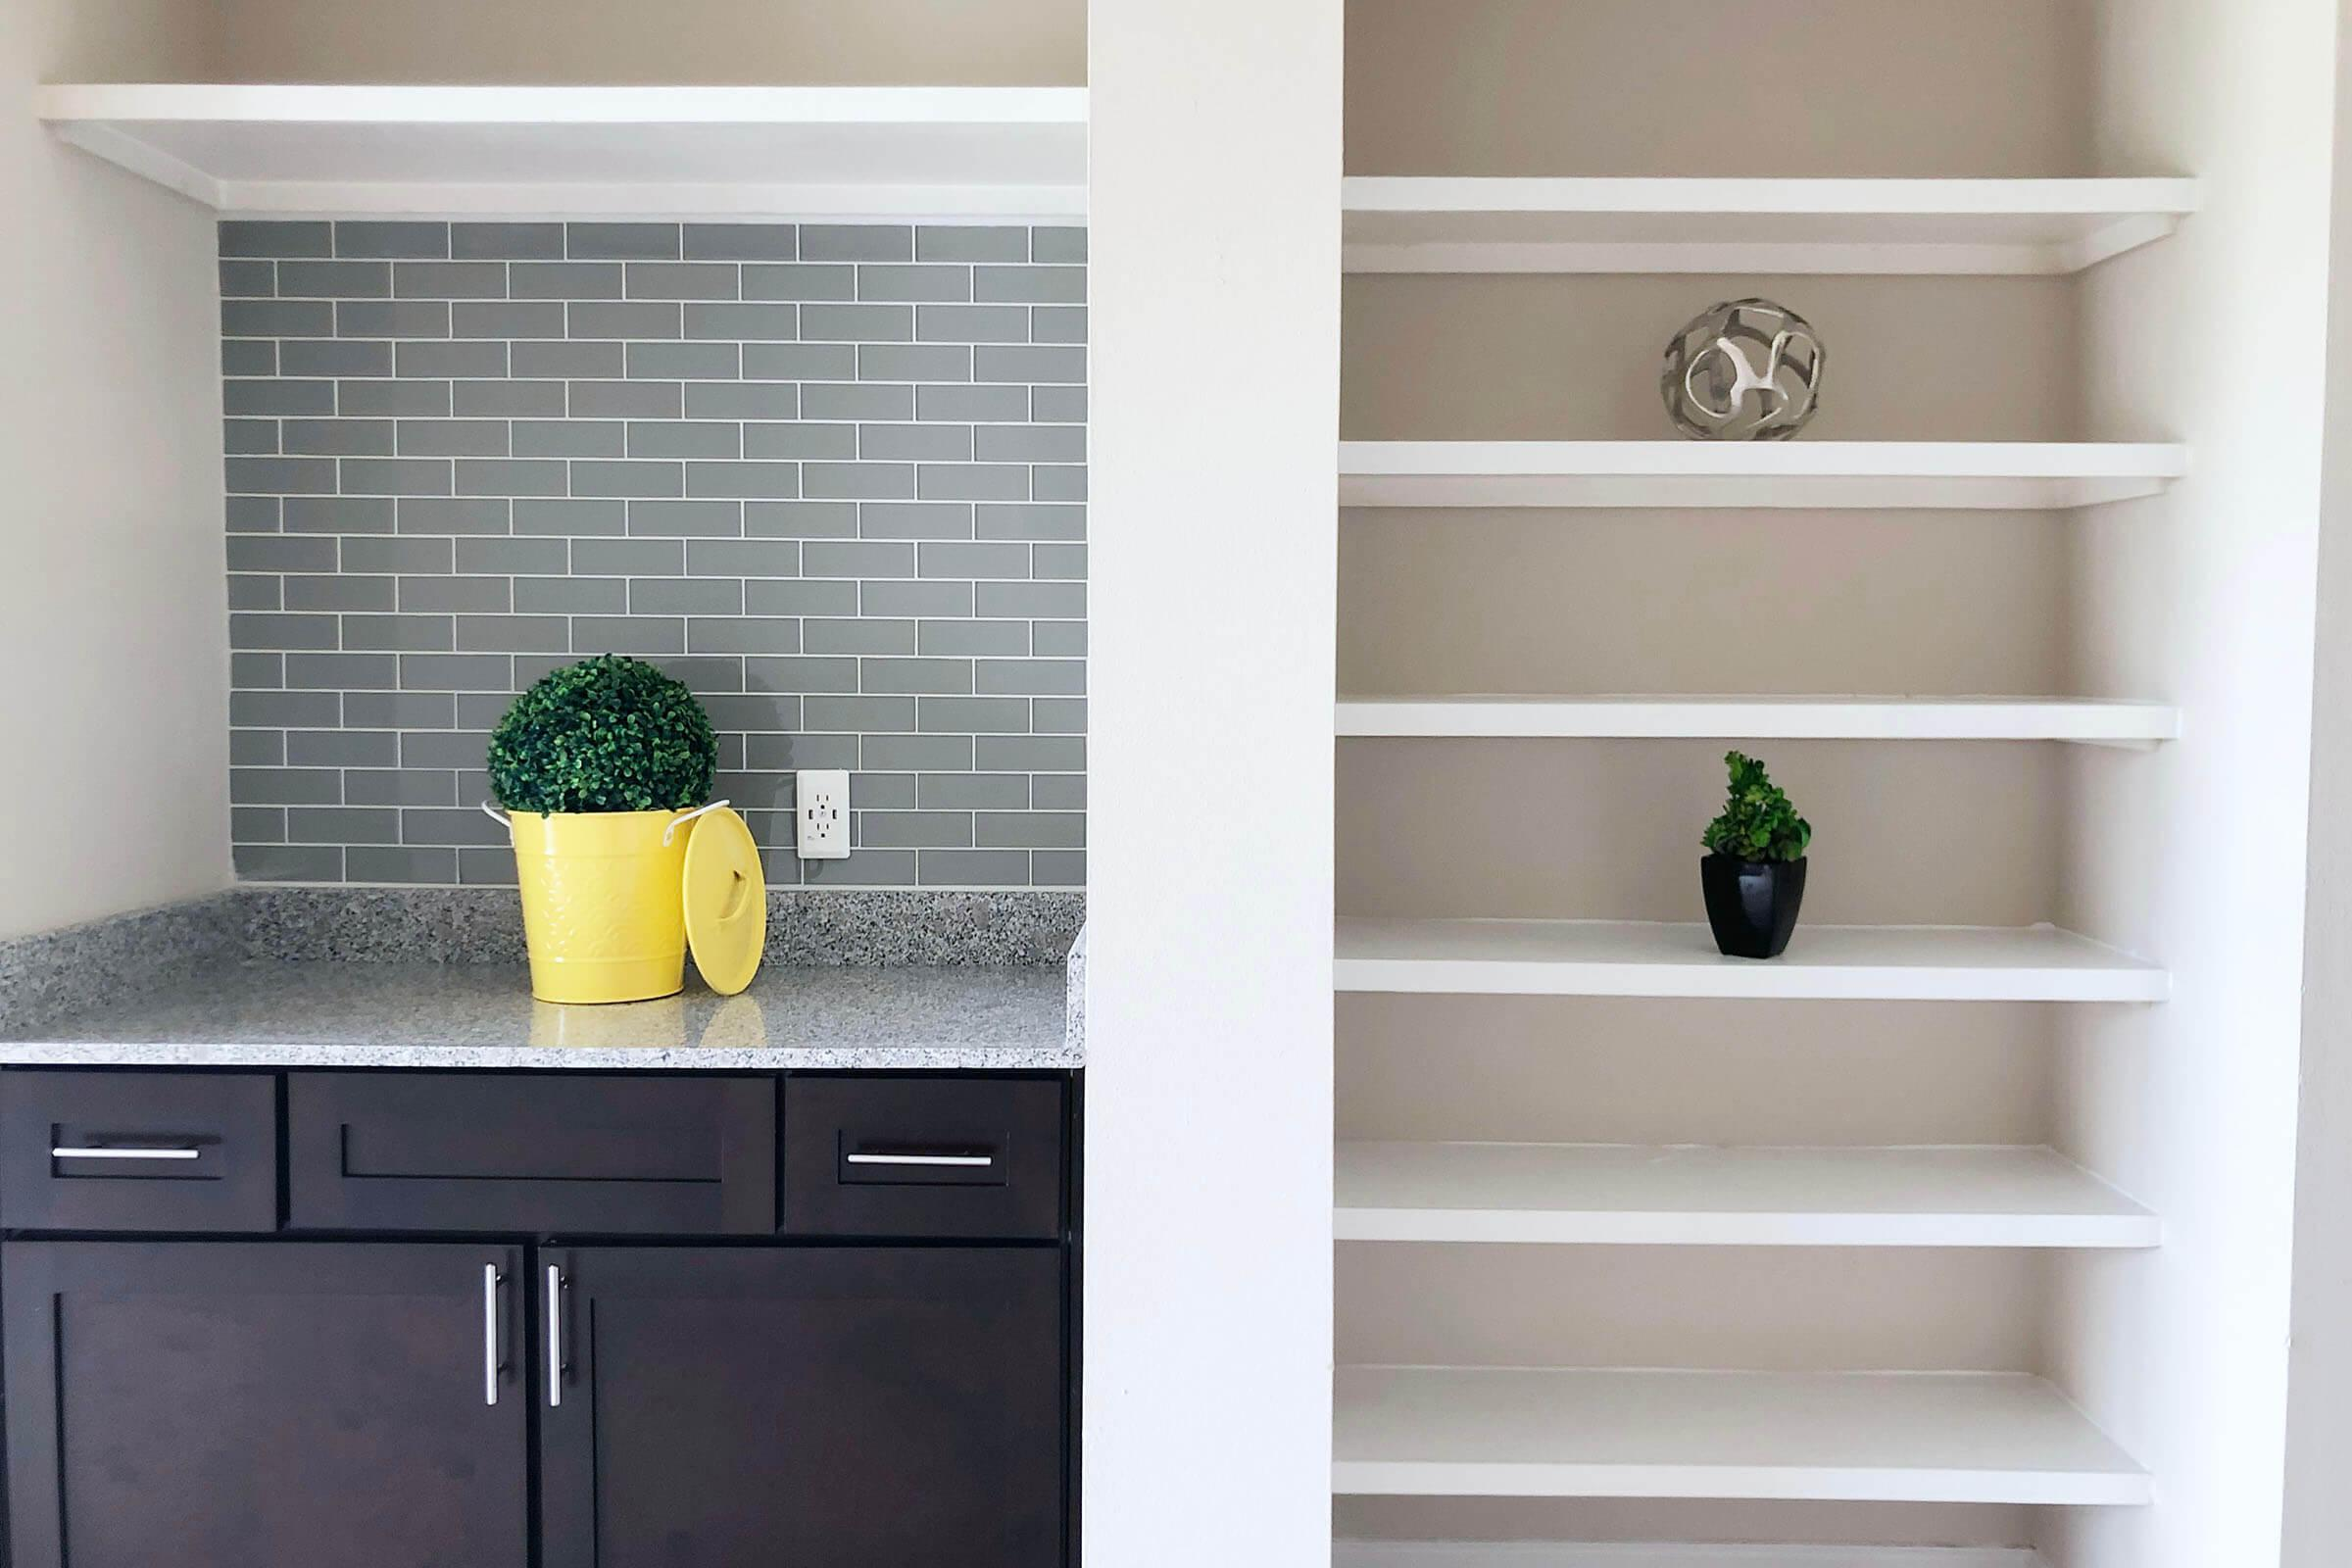 a vase of flowers sitting on a shelf